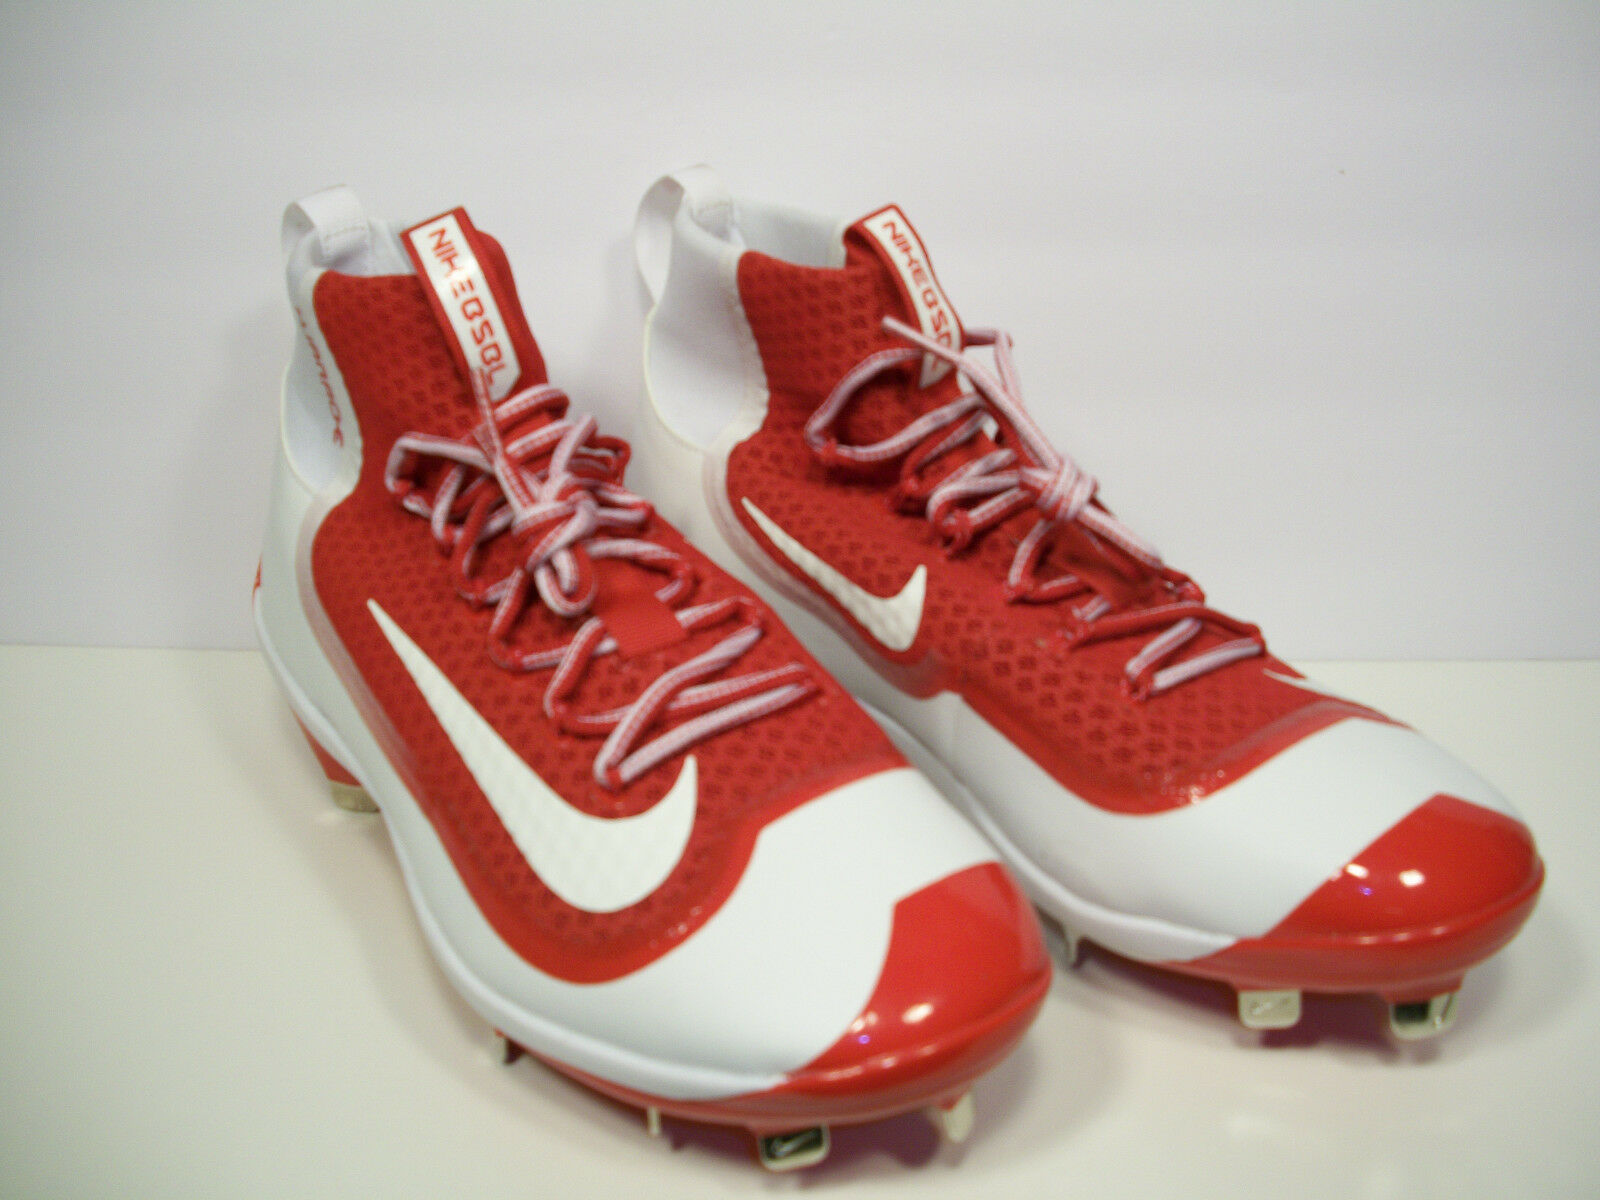 Nike Air huarache metal mugre Baseball cleats 749359-610 2K mugre metal Elite Rojo / blanco 11 98d5b7